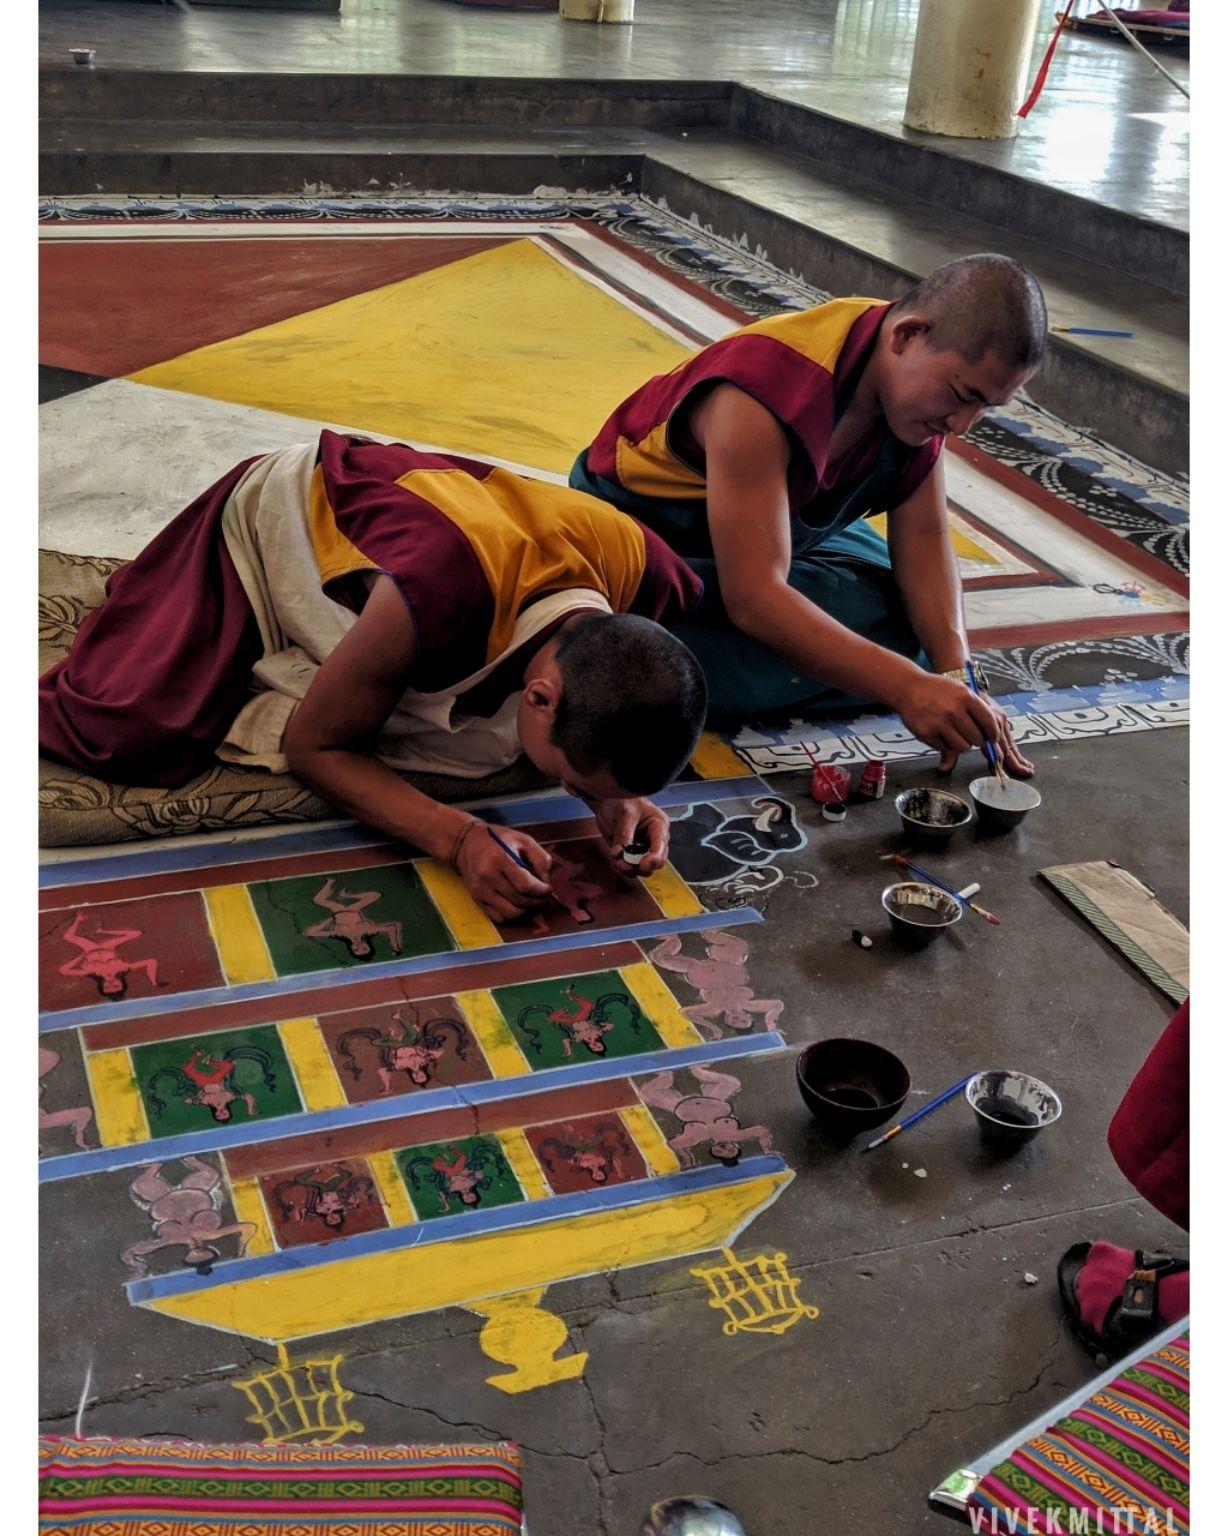 Photo of H.H. the Dalai Lama's Main Temple By Vivek mittal